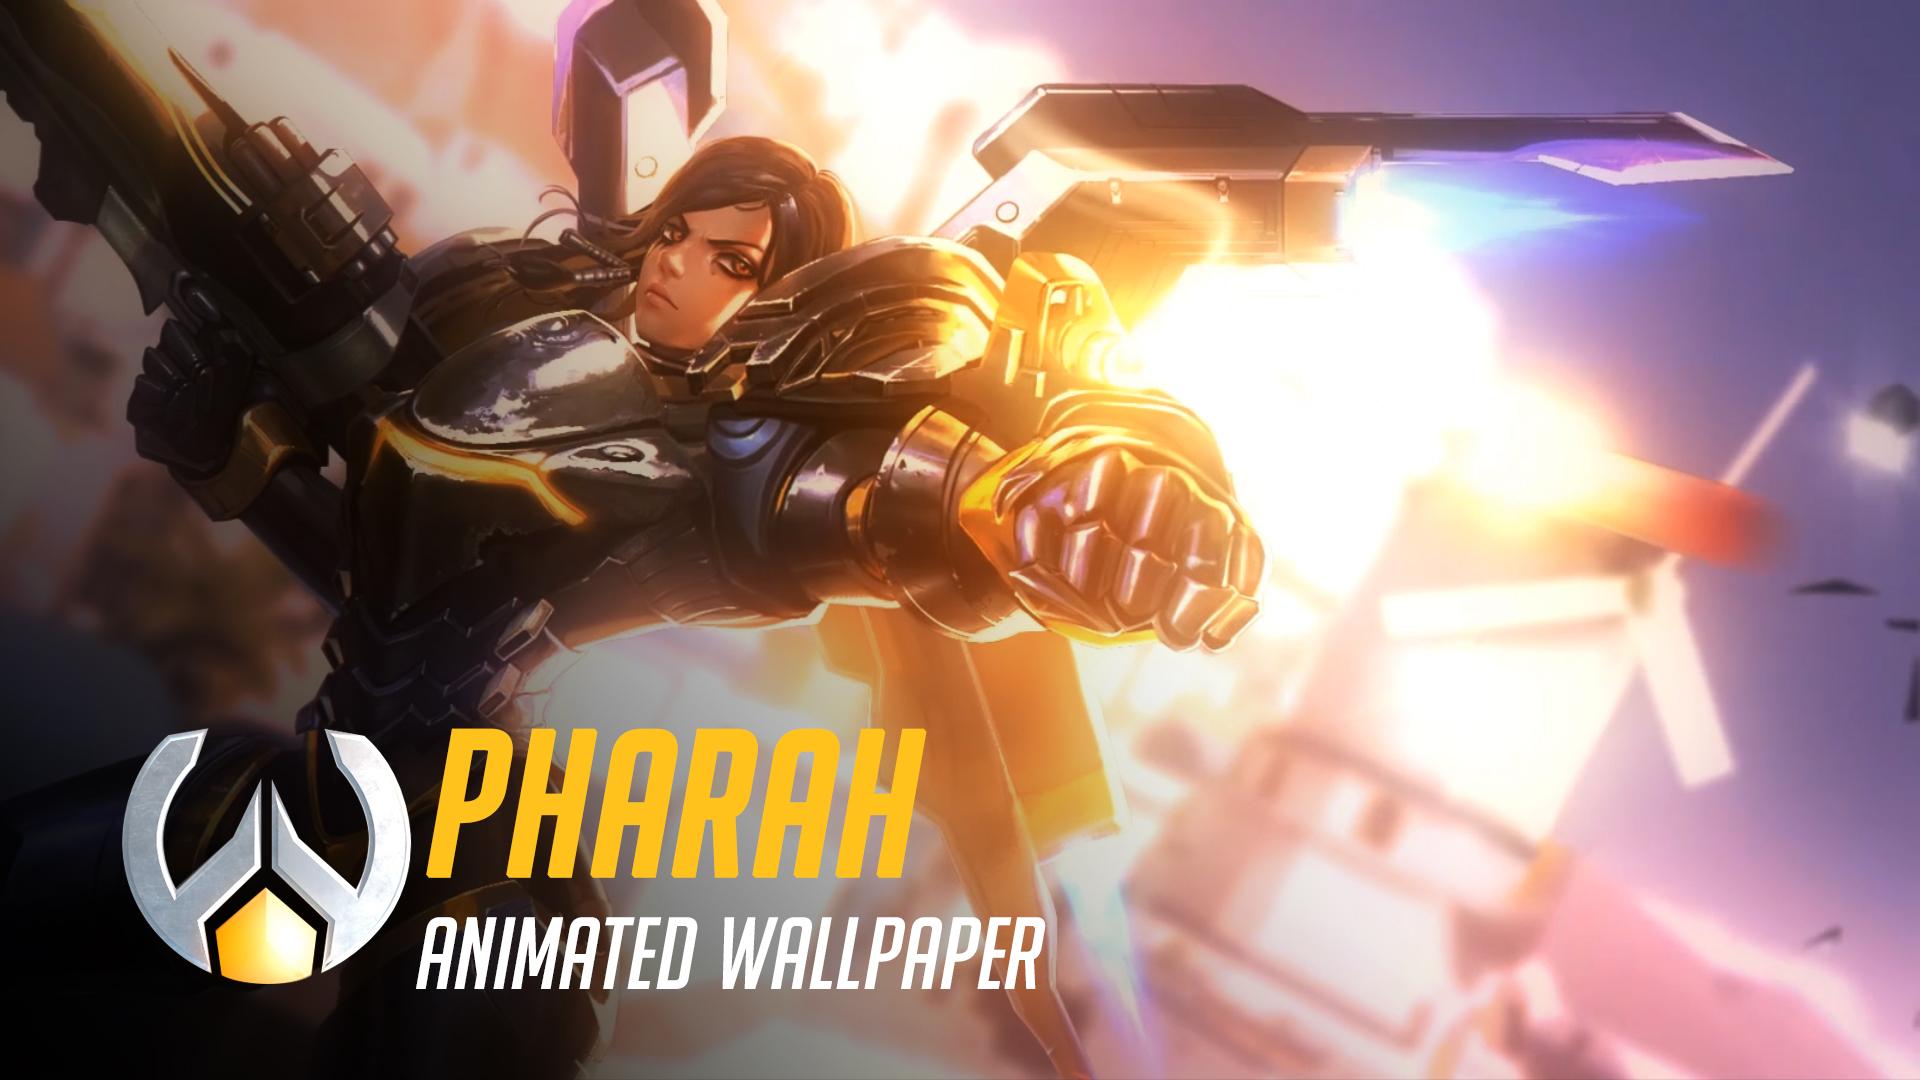 Wallpaper Engine - Pharah | Animated Wallpaper - Overwatch